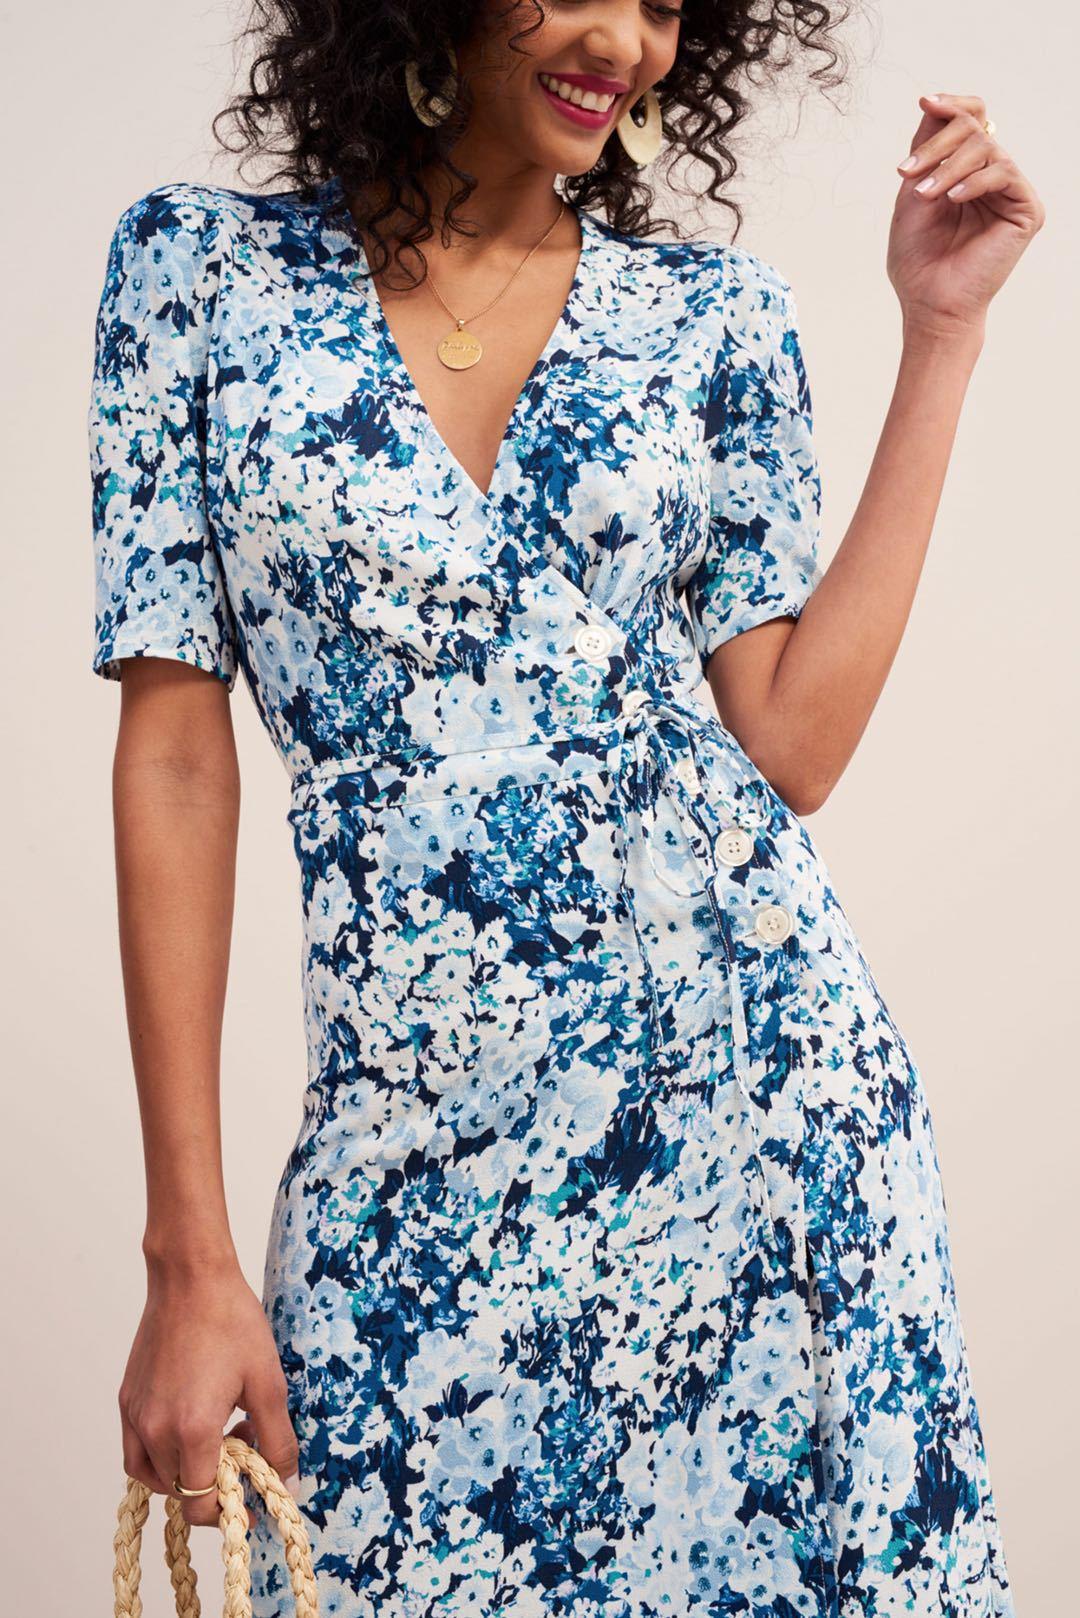 Women Dress V Neck 2019 Elegant French Side Button Wrap Midi Dress